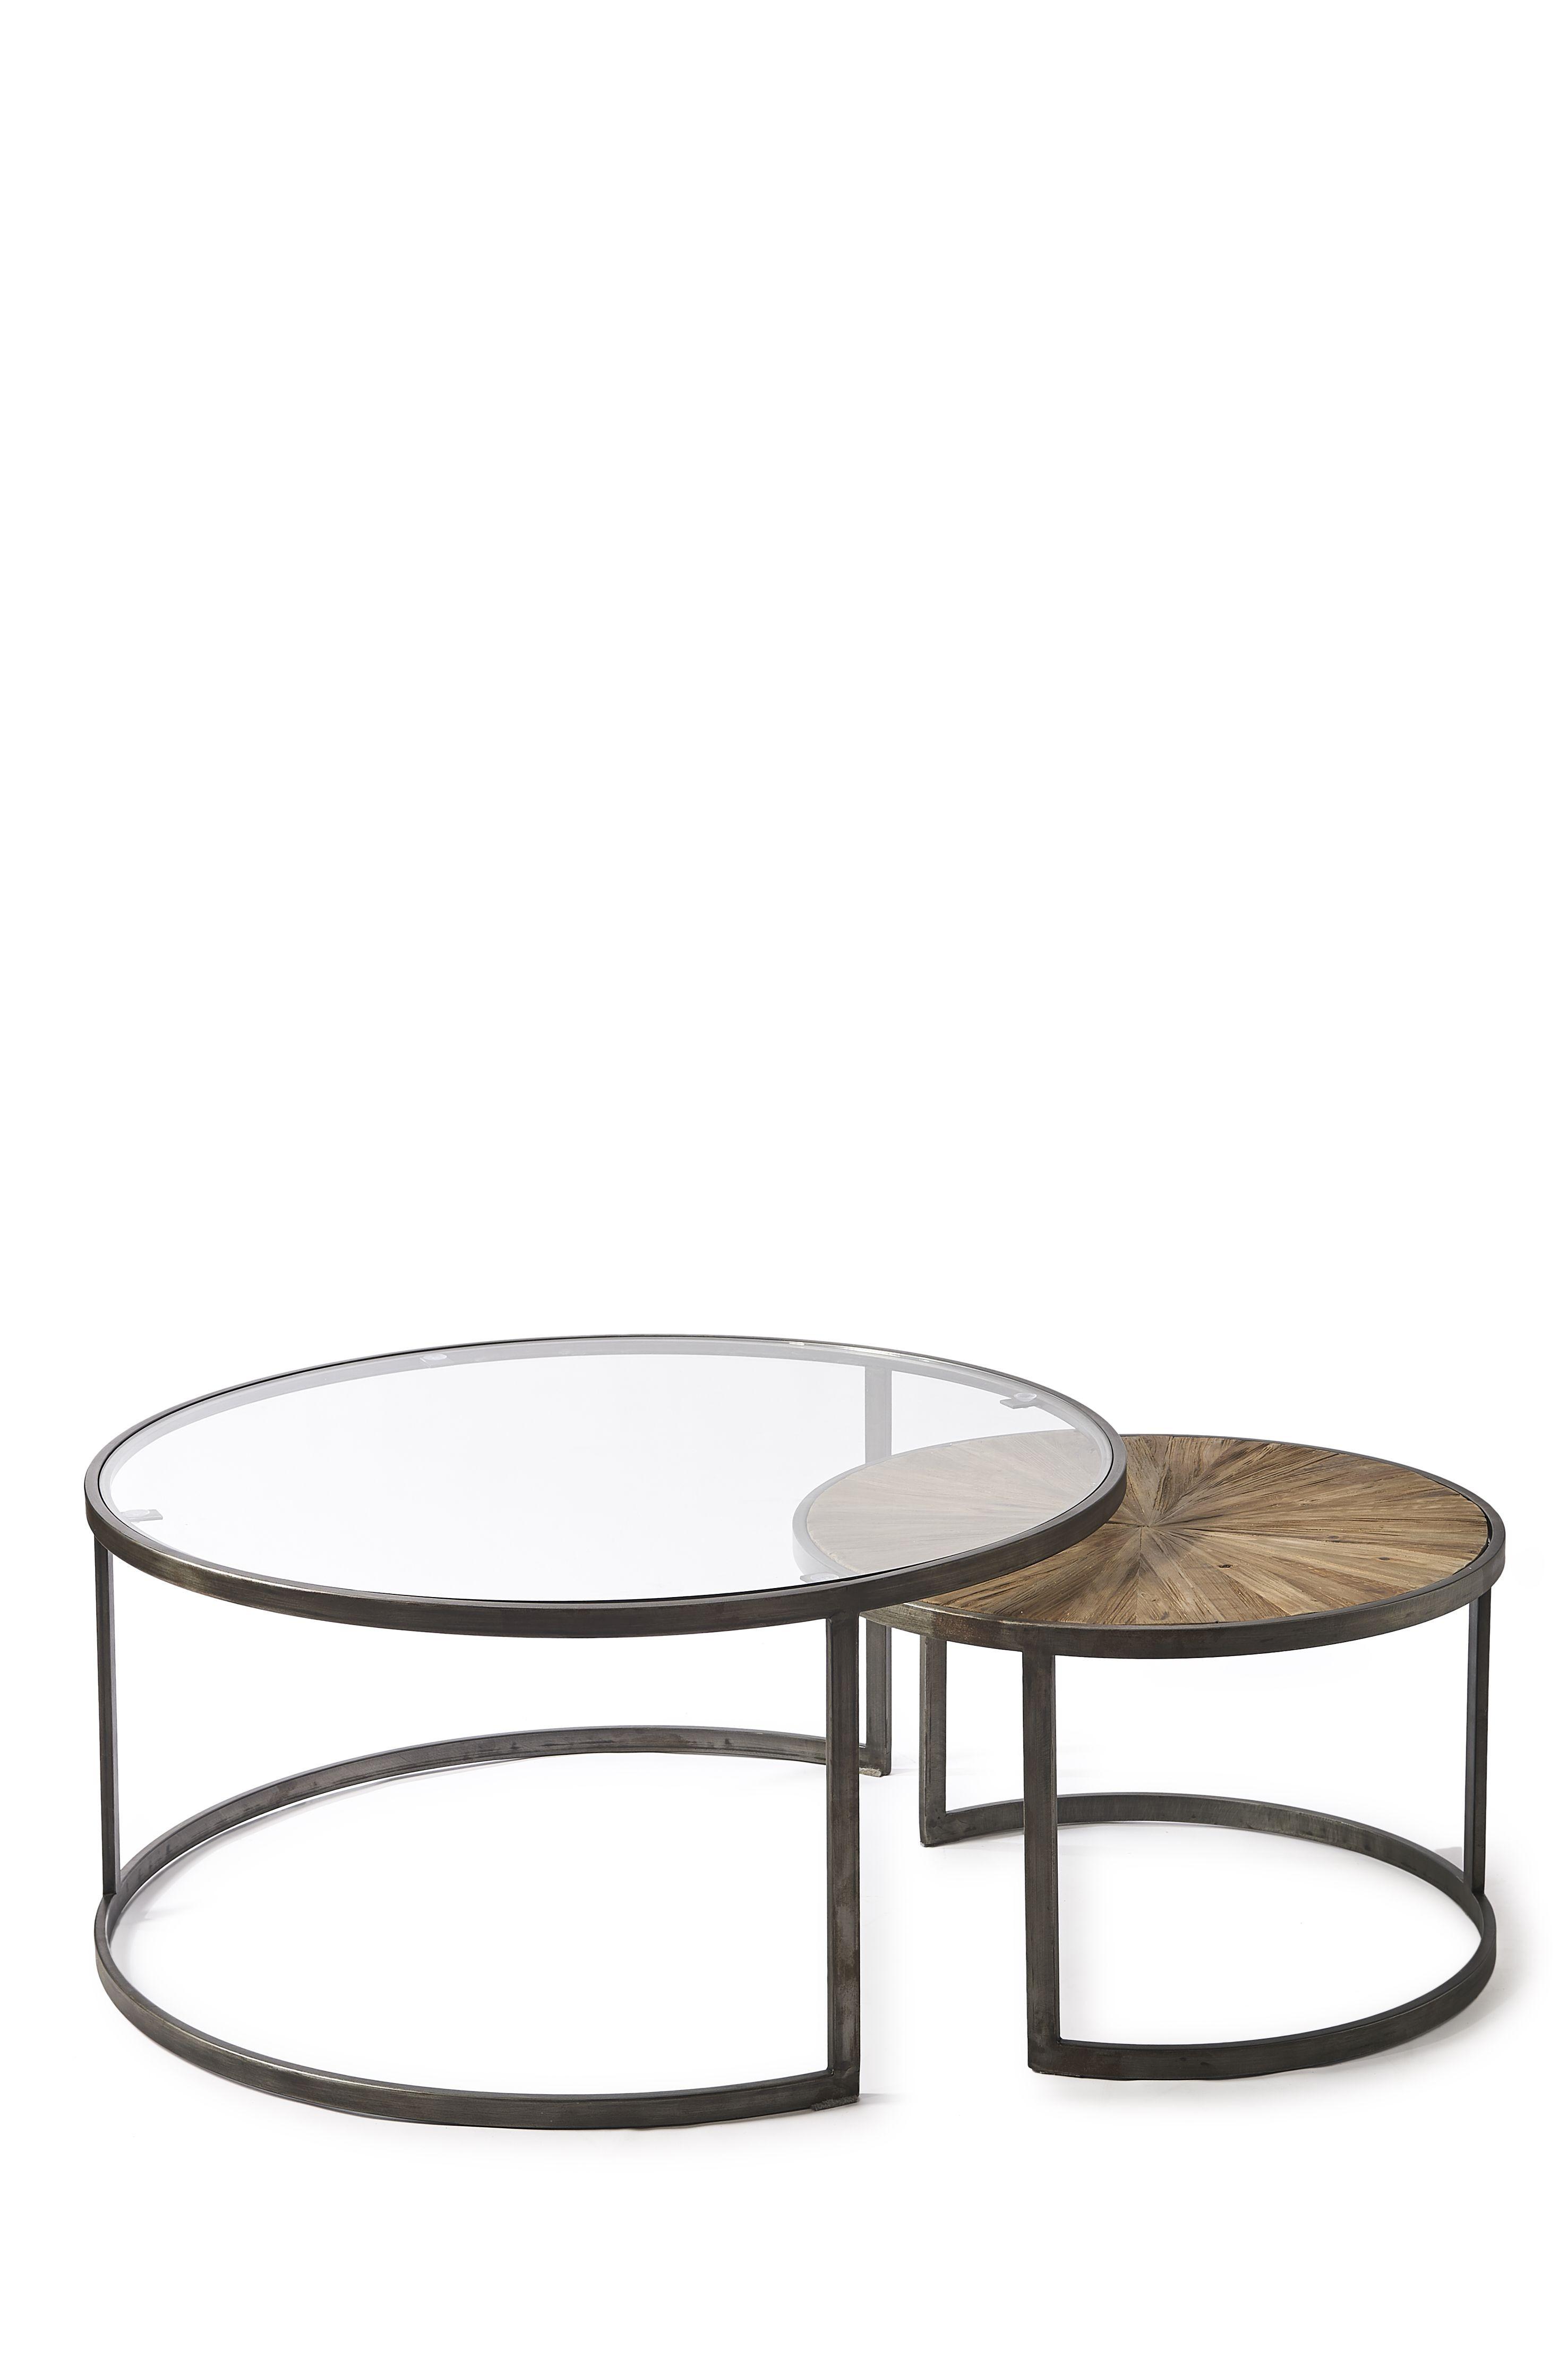 Cameron Coffee Table Set van 2 / Rivièra Maison